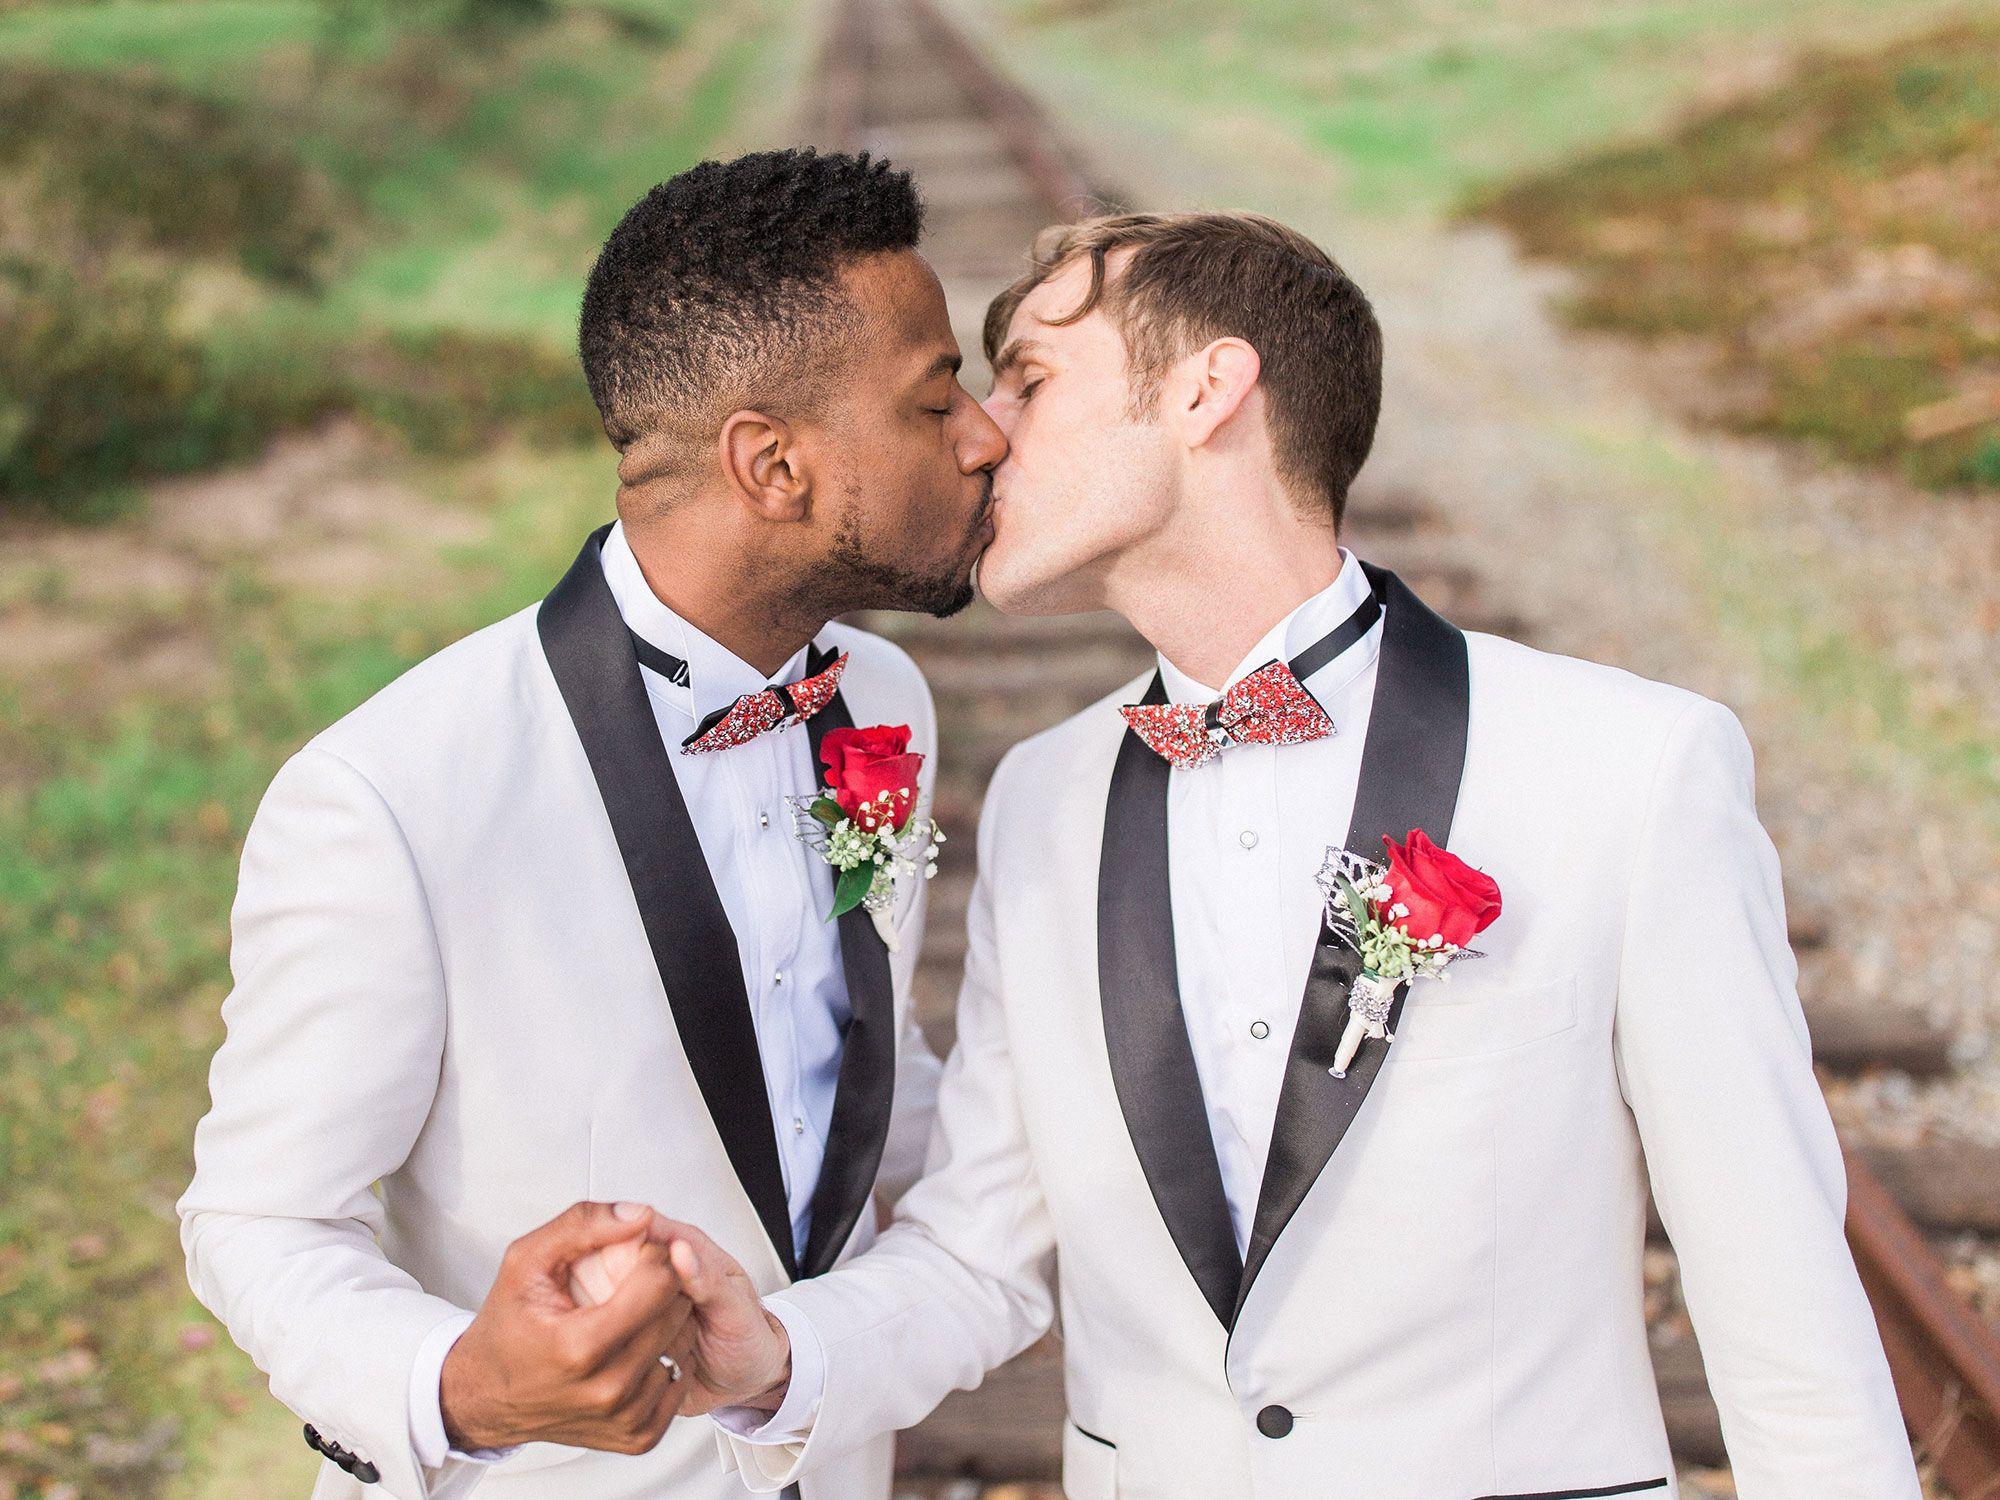 Pin On Inclusive Wedding Vendors